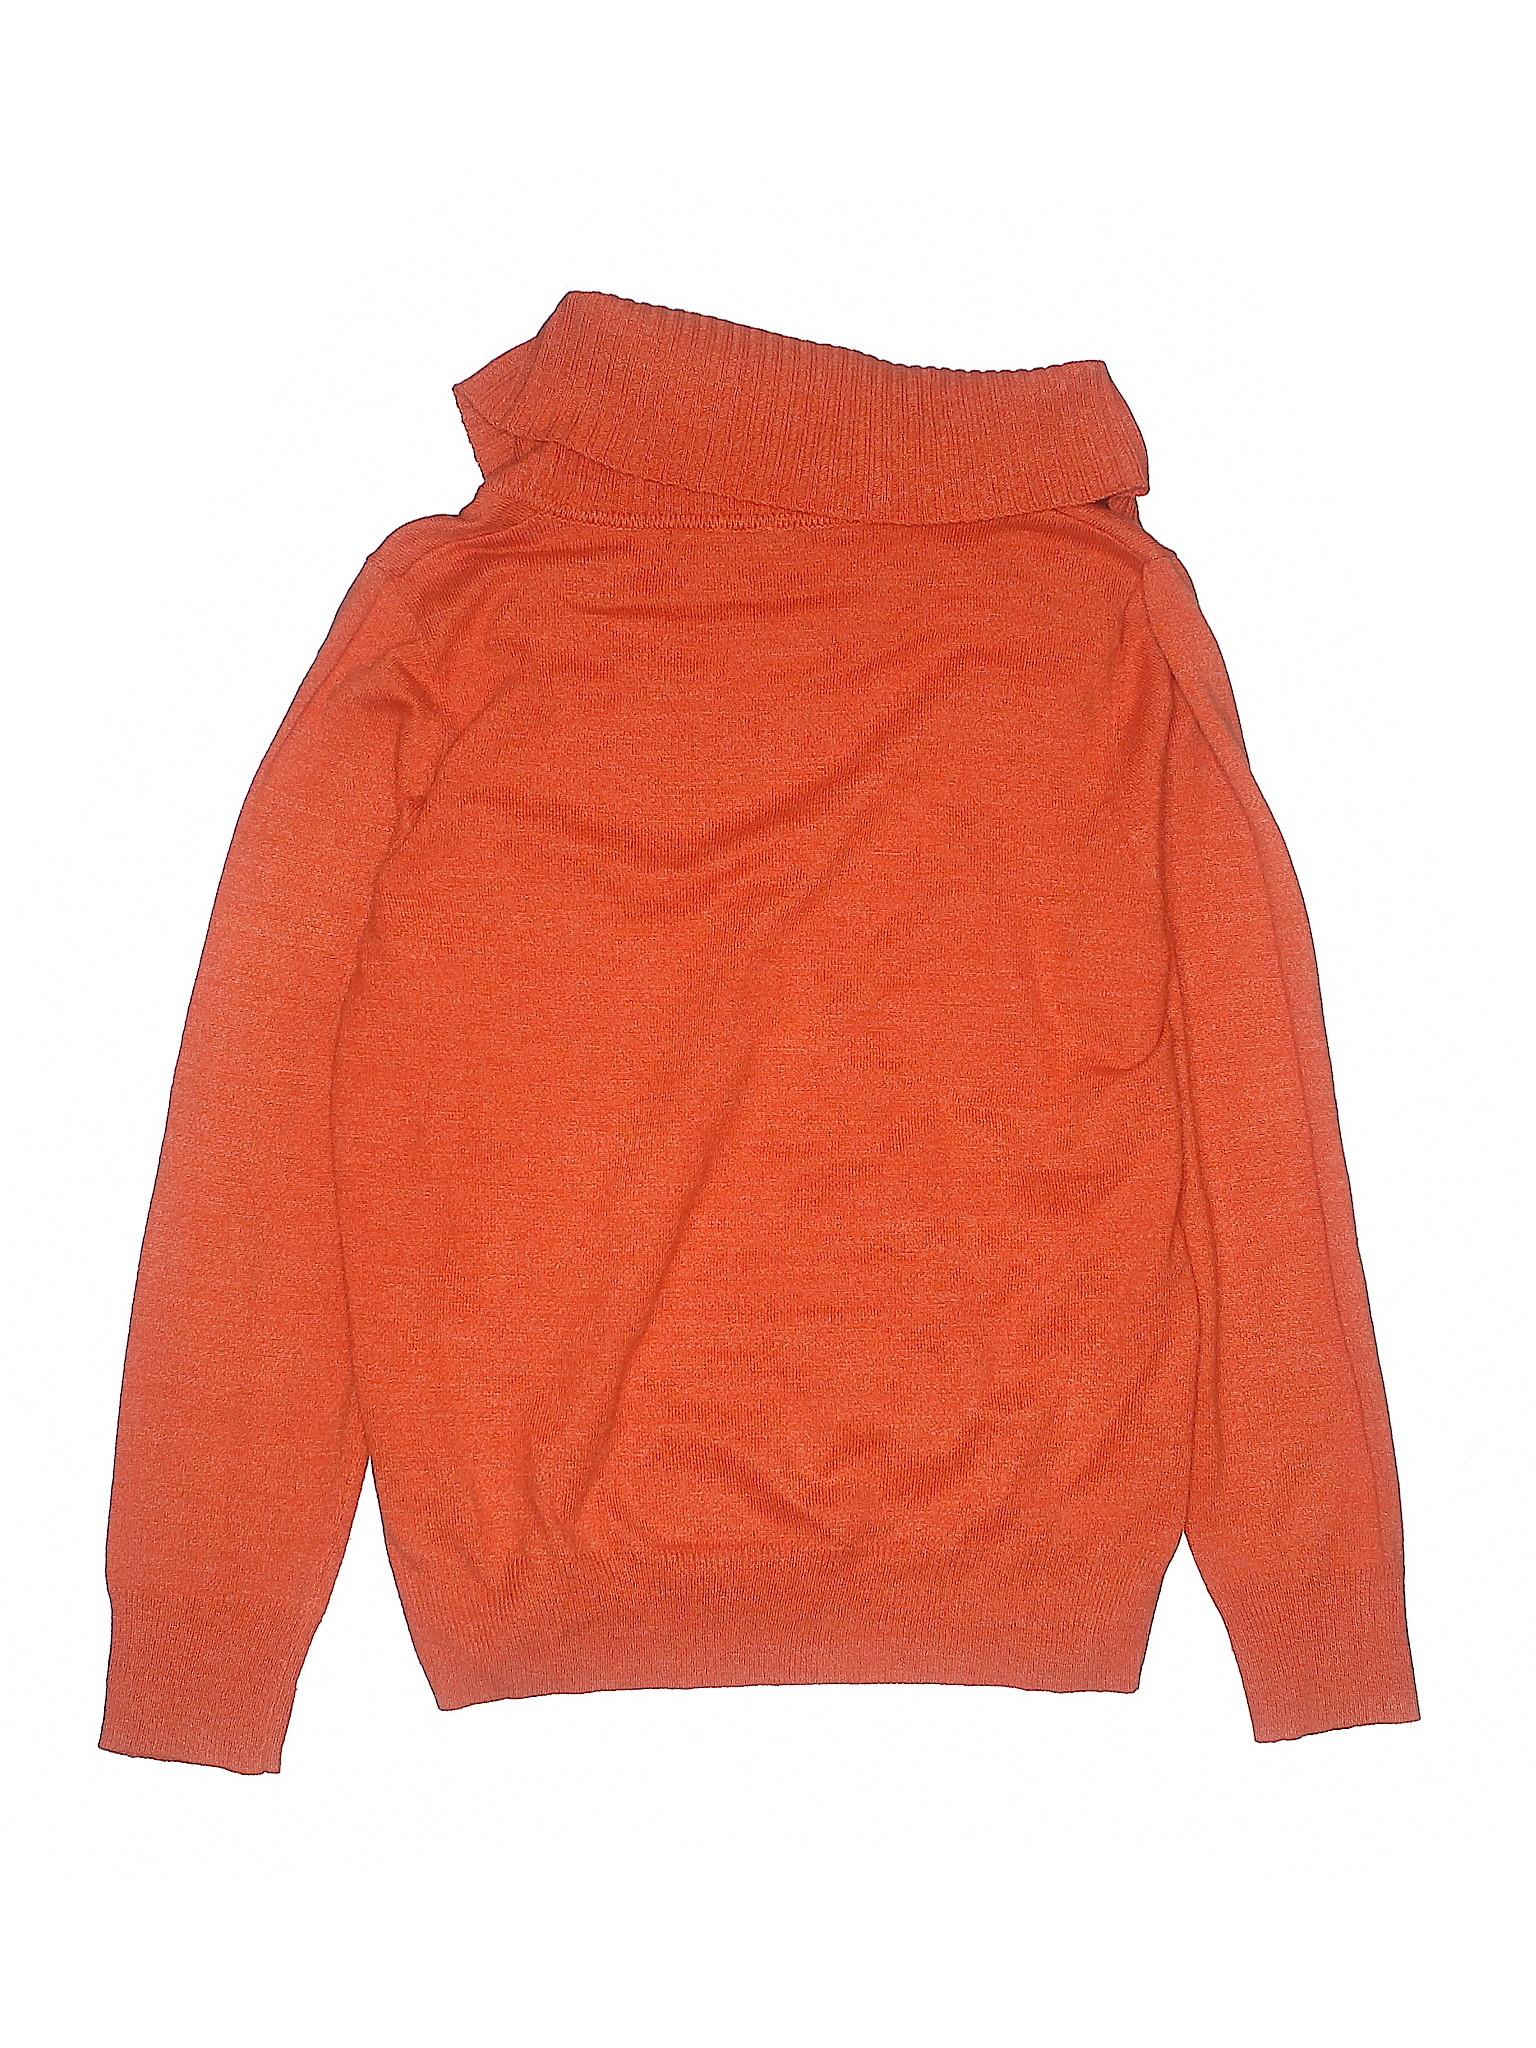 Connection Western Boutique Sweater Pullover winter E5qzwq1